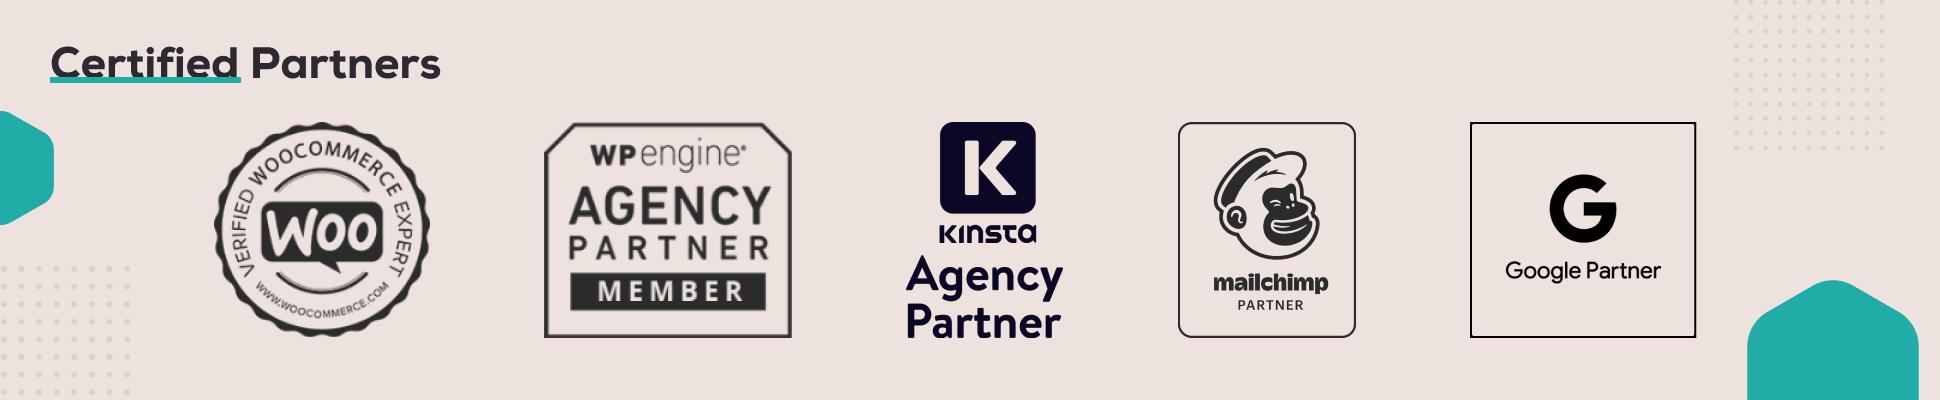 AnnexCore partner logos.